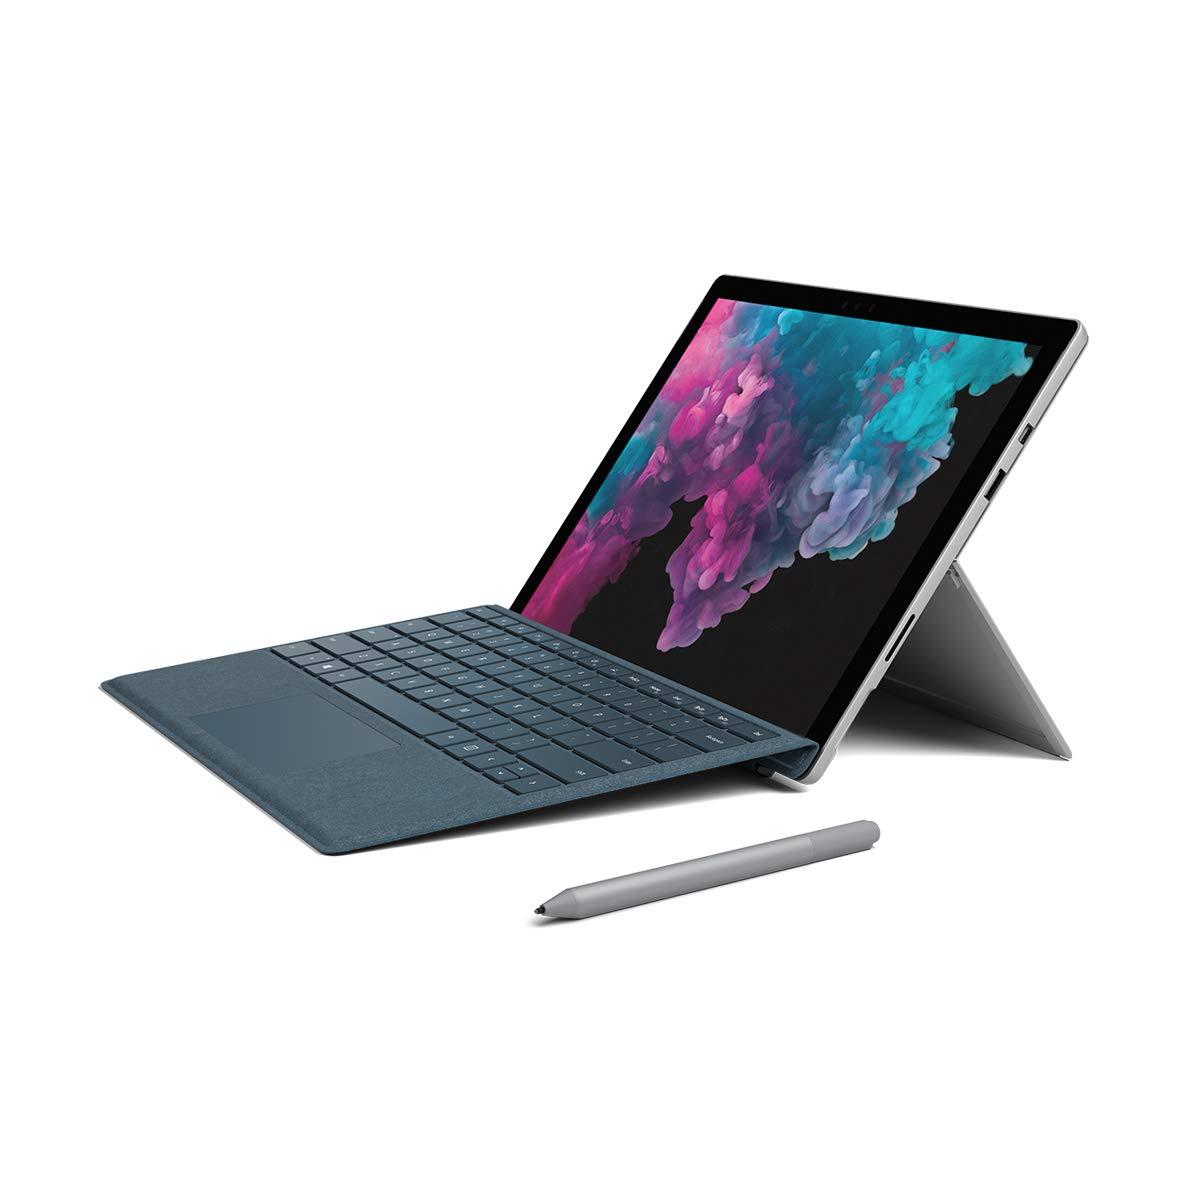 🔥 Prime Day 2019 : la dernière Microsoft Surface Pro tombe à 749 euros